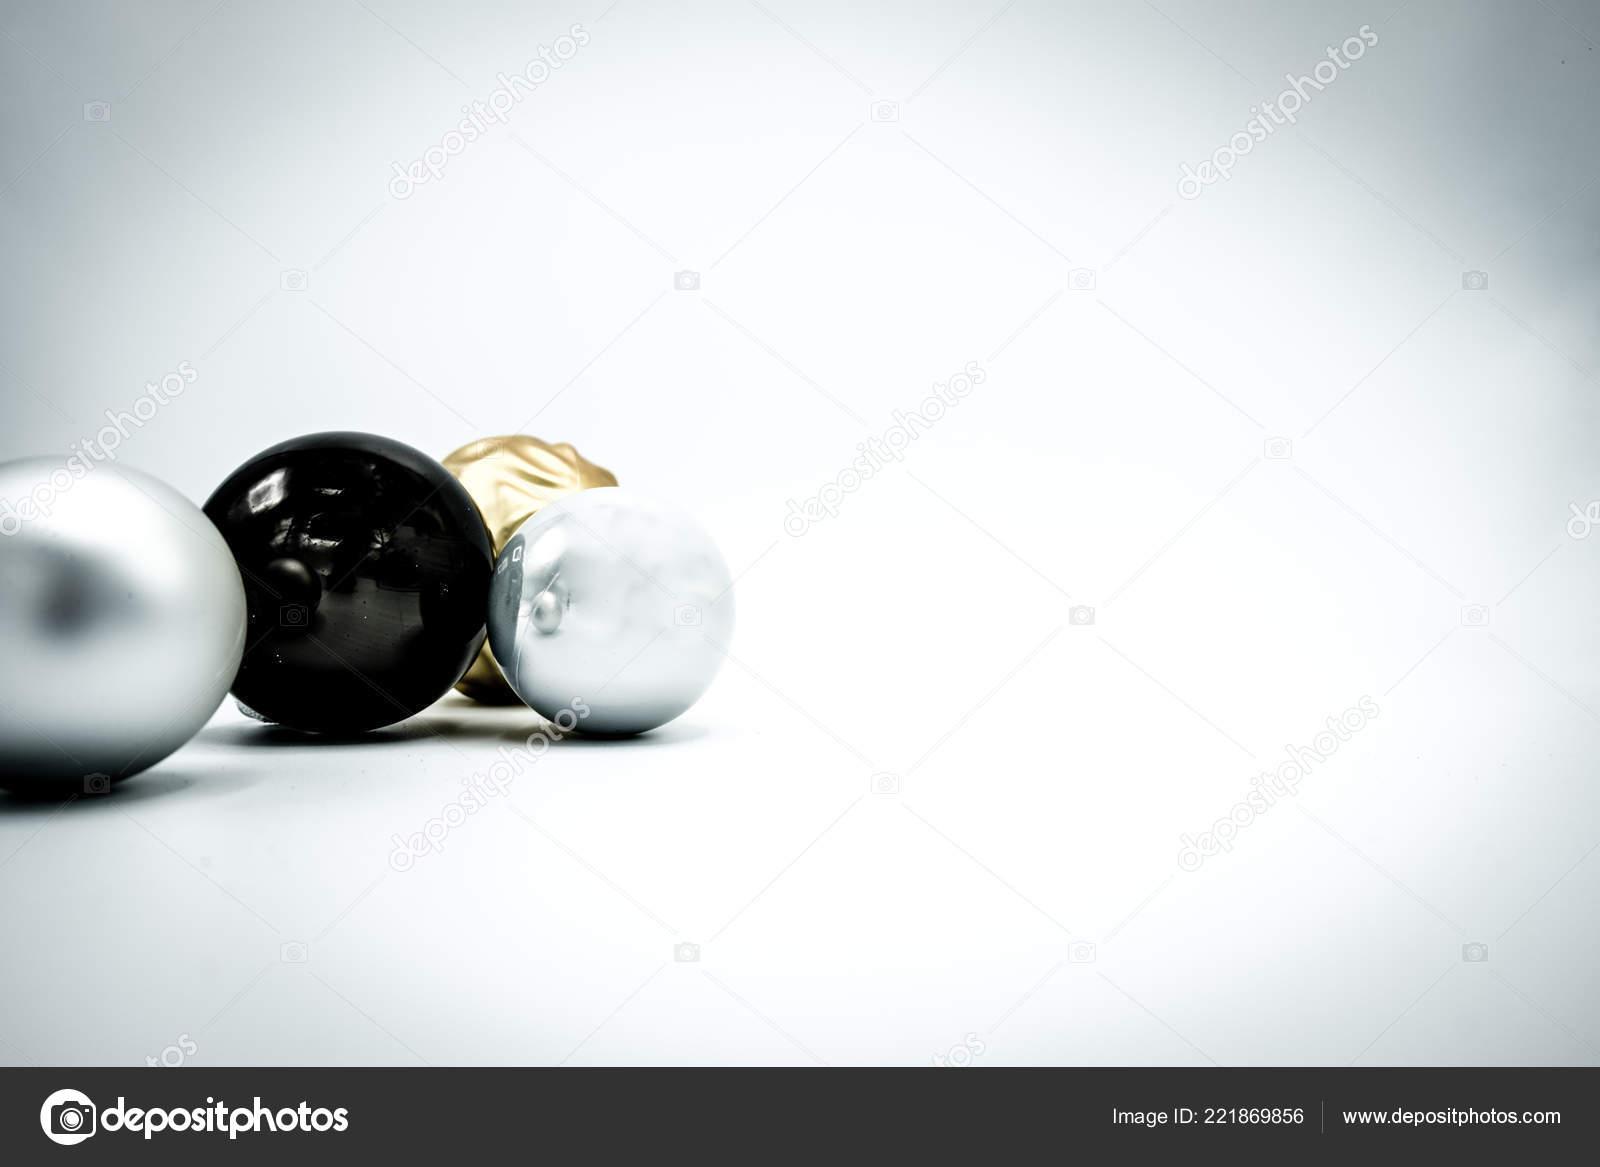 depositphotos 221869856 stock photo monochrome elegant christmas wallpaper background